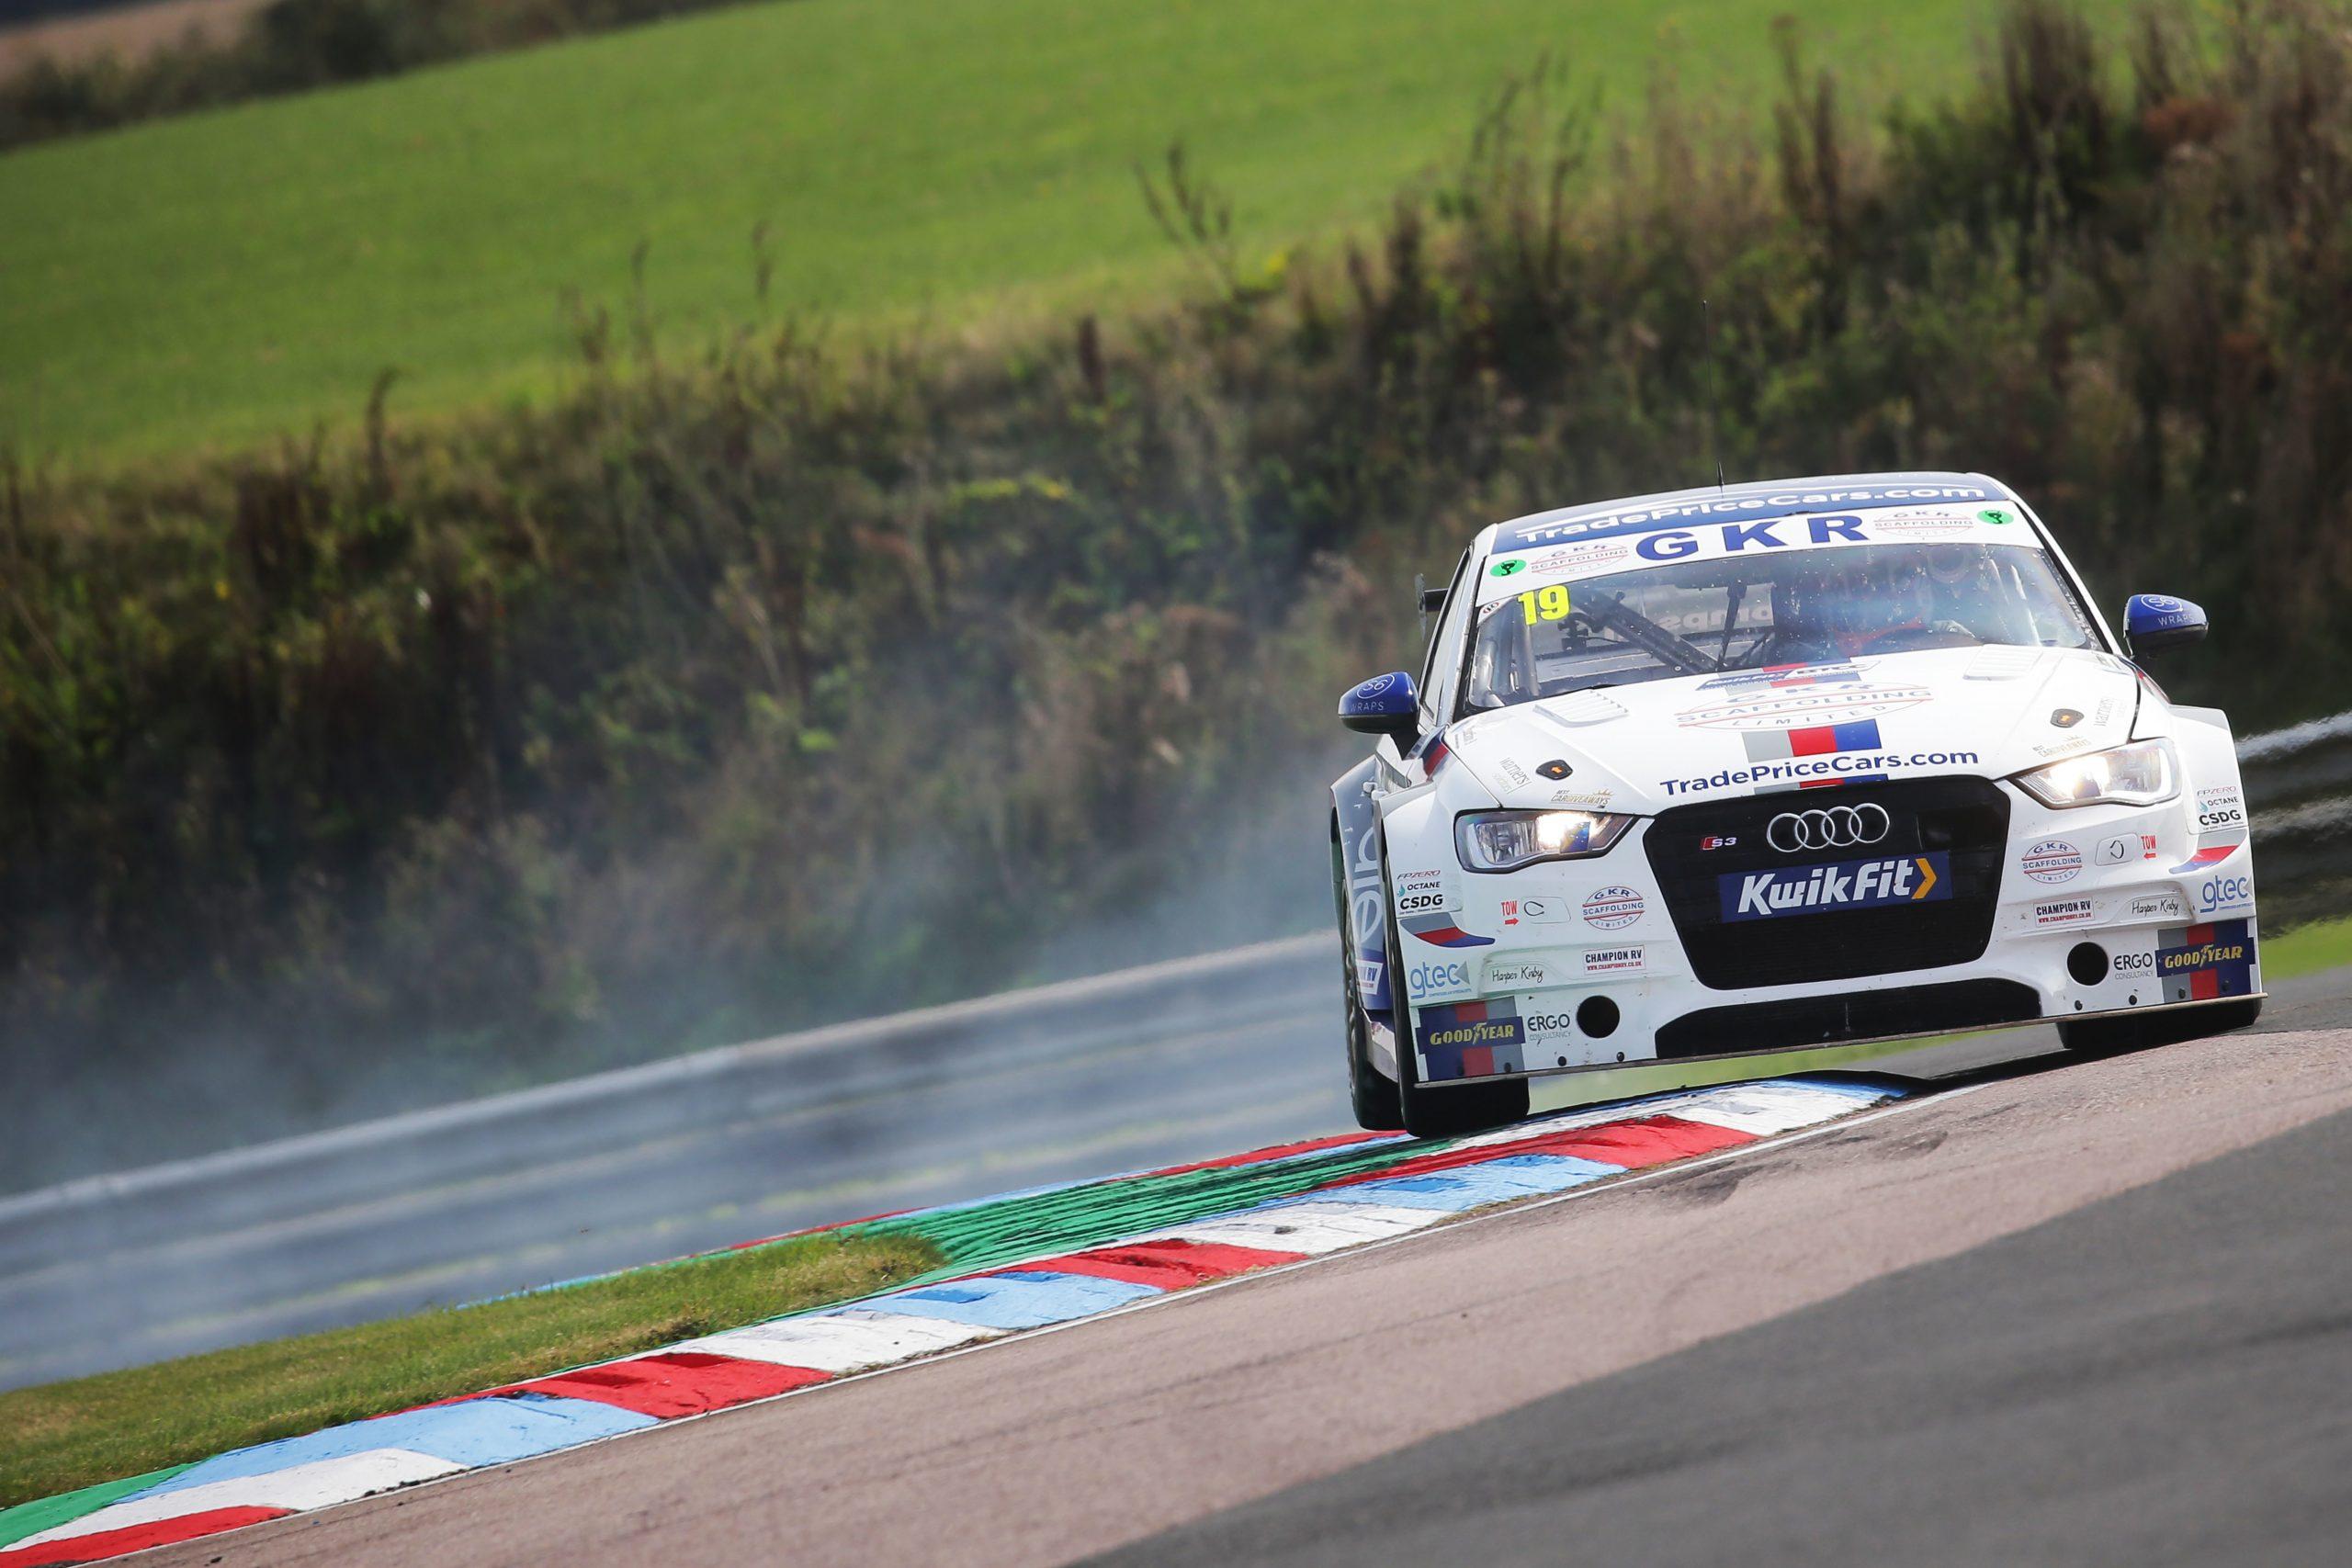 GKR TradePriceCars.com battles hard for Thruxton points finish